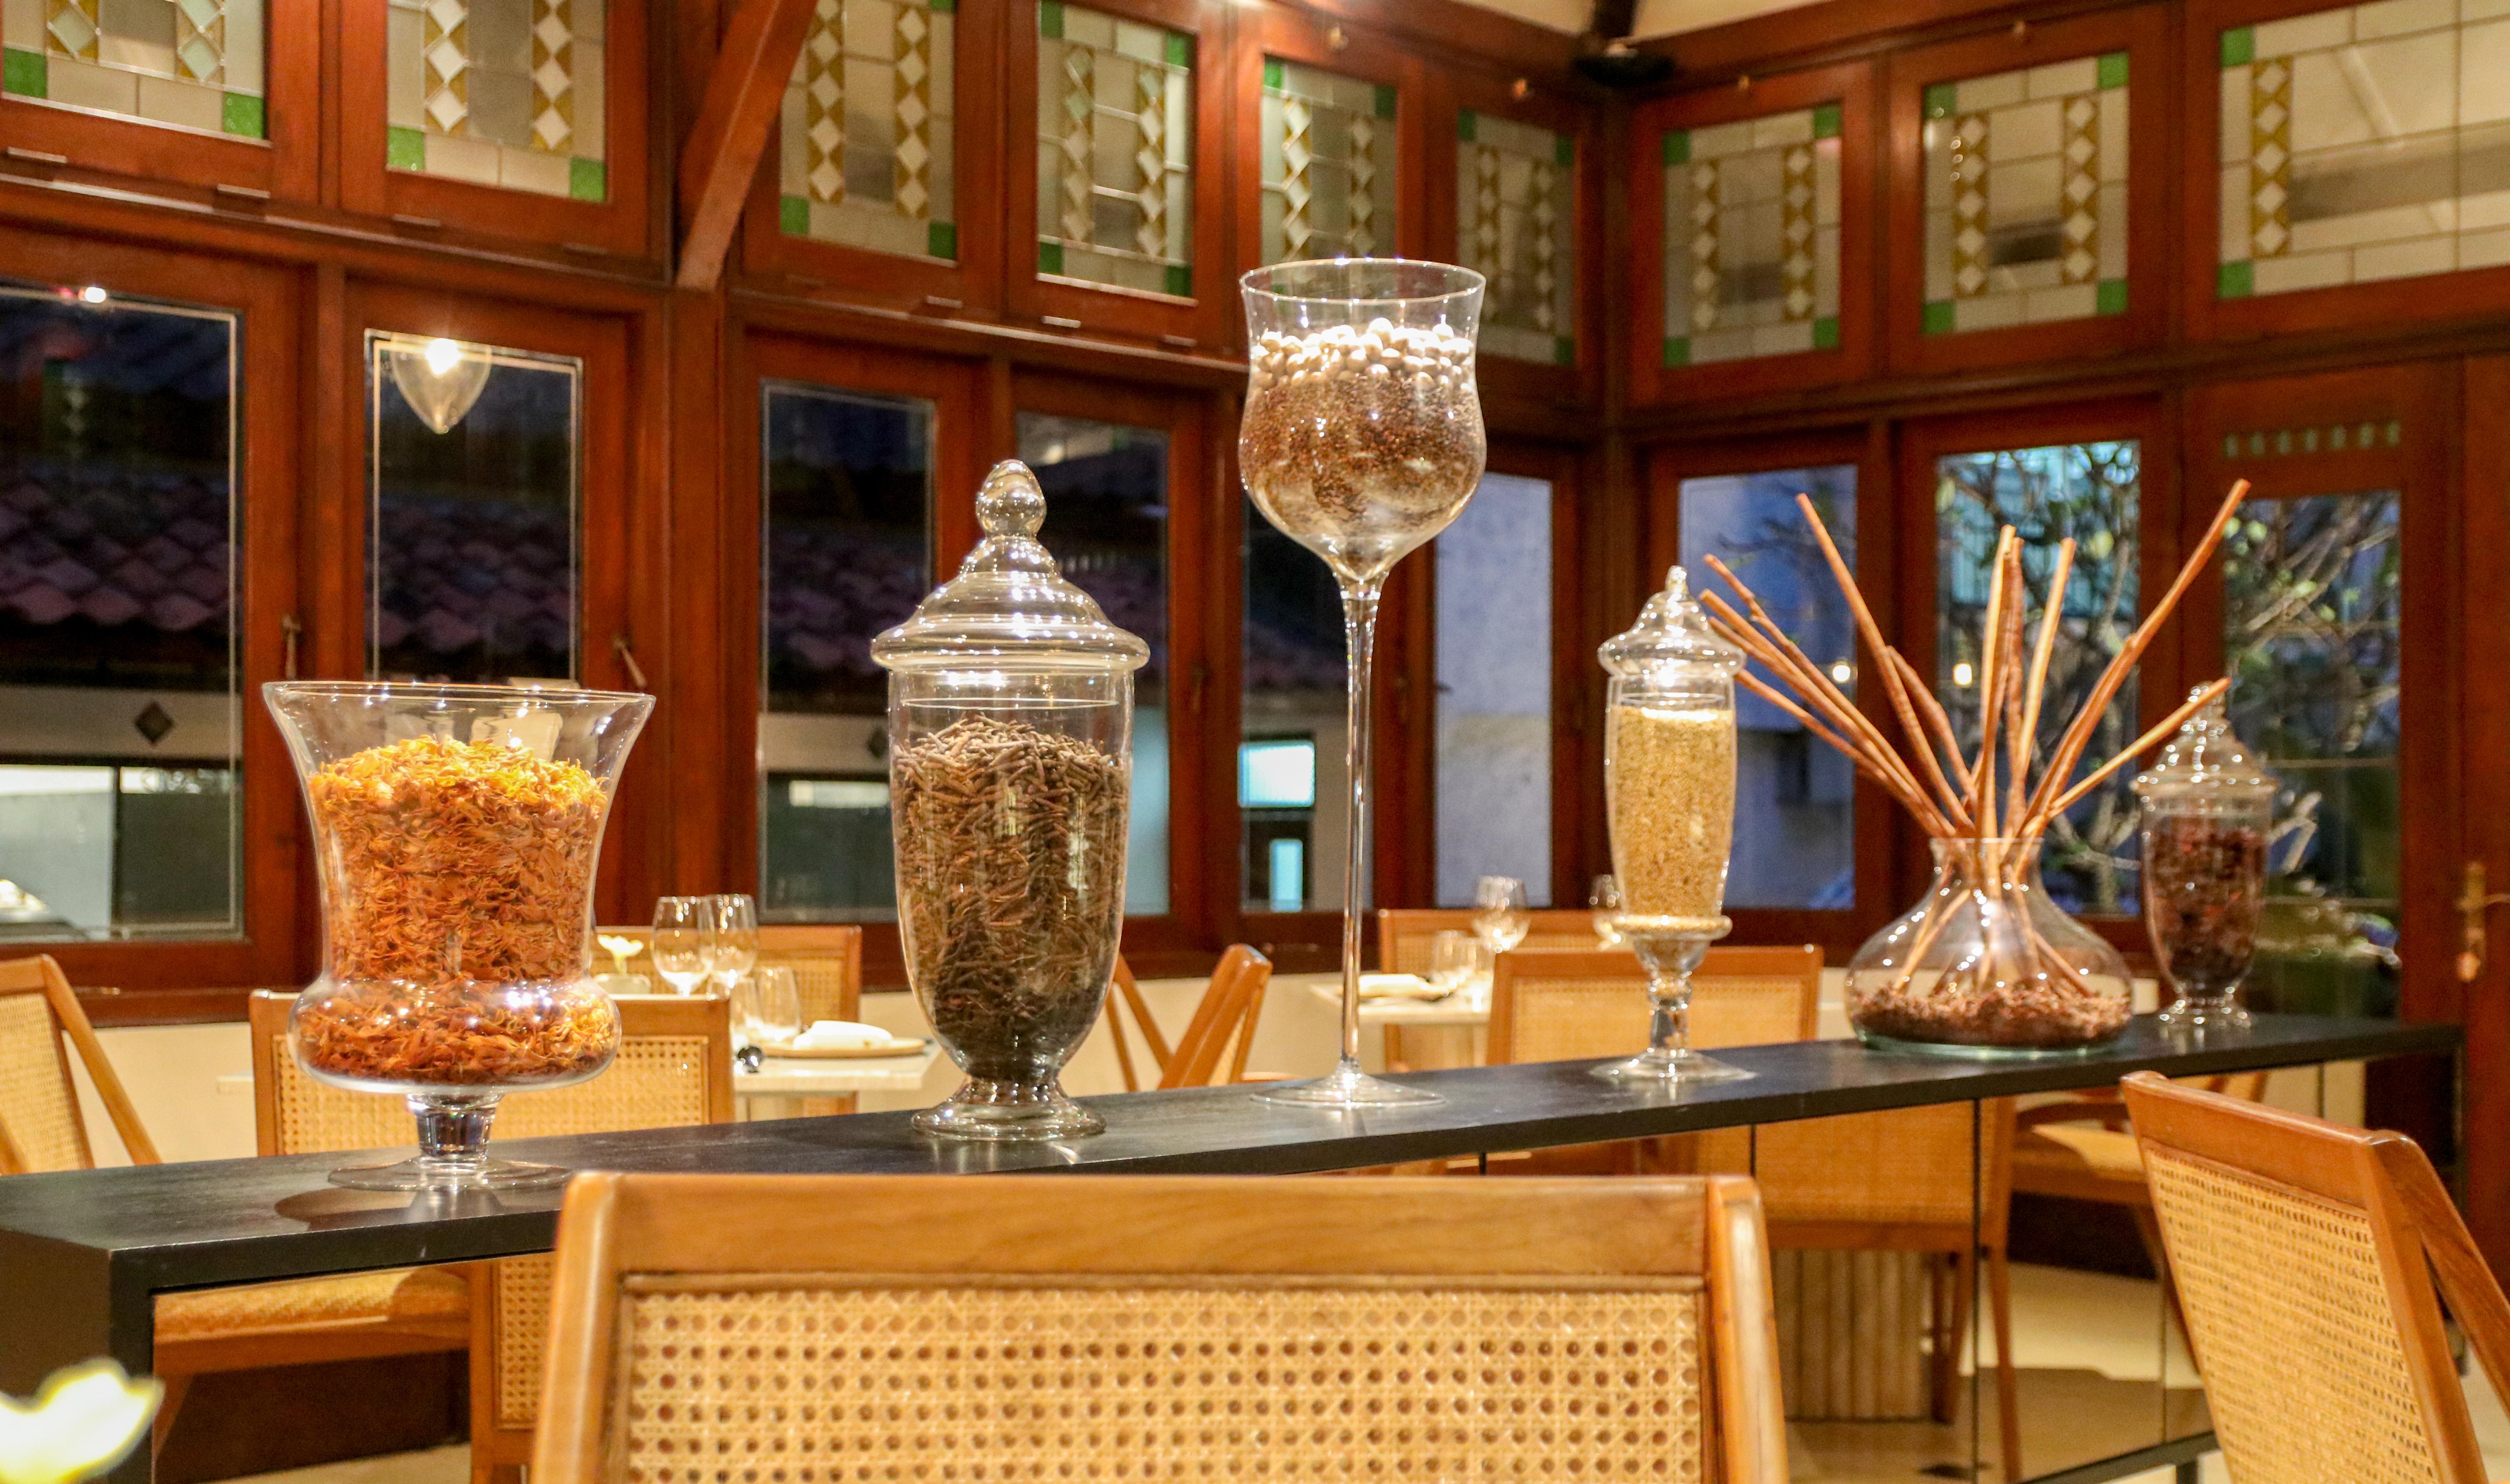 Restaurants for buka puasa in Jakarta: NUSA Gastronomy serves up a special Ramadan Indonesian set menu